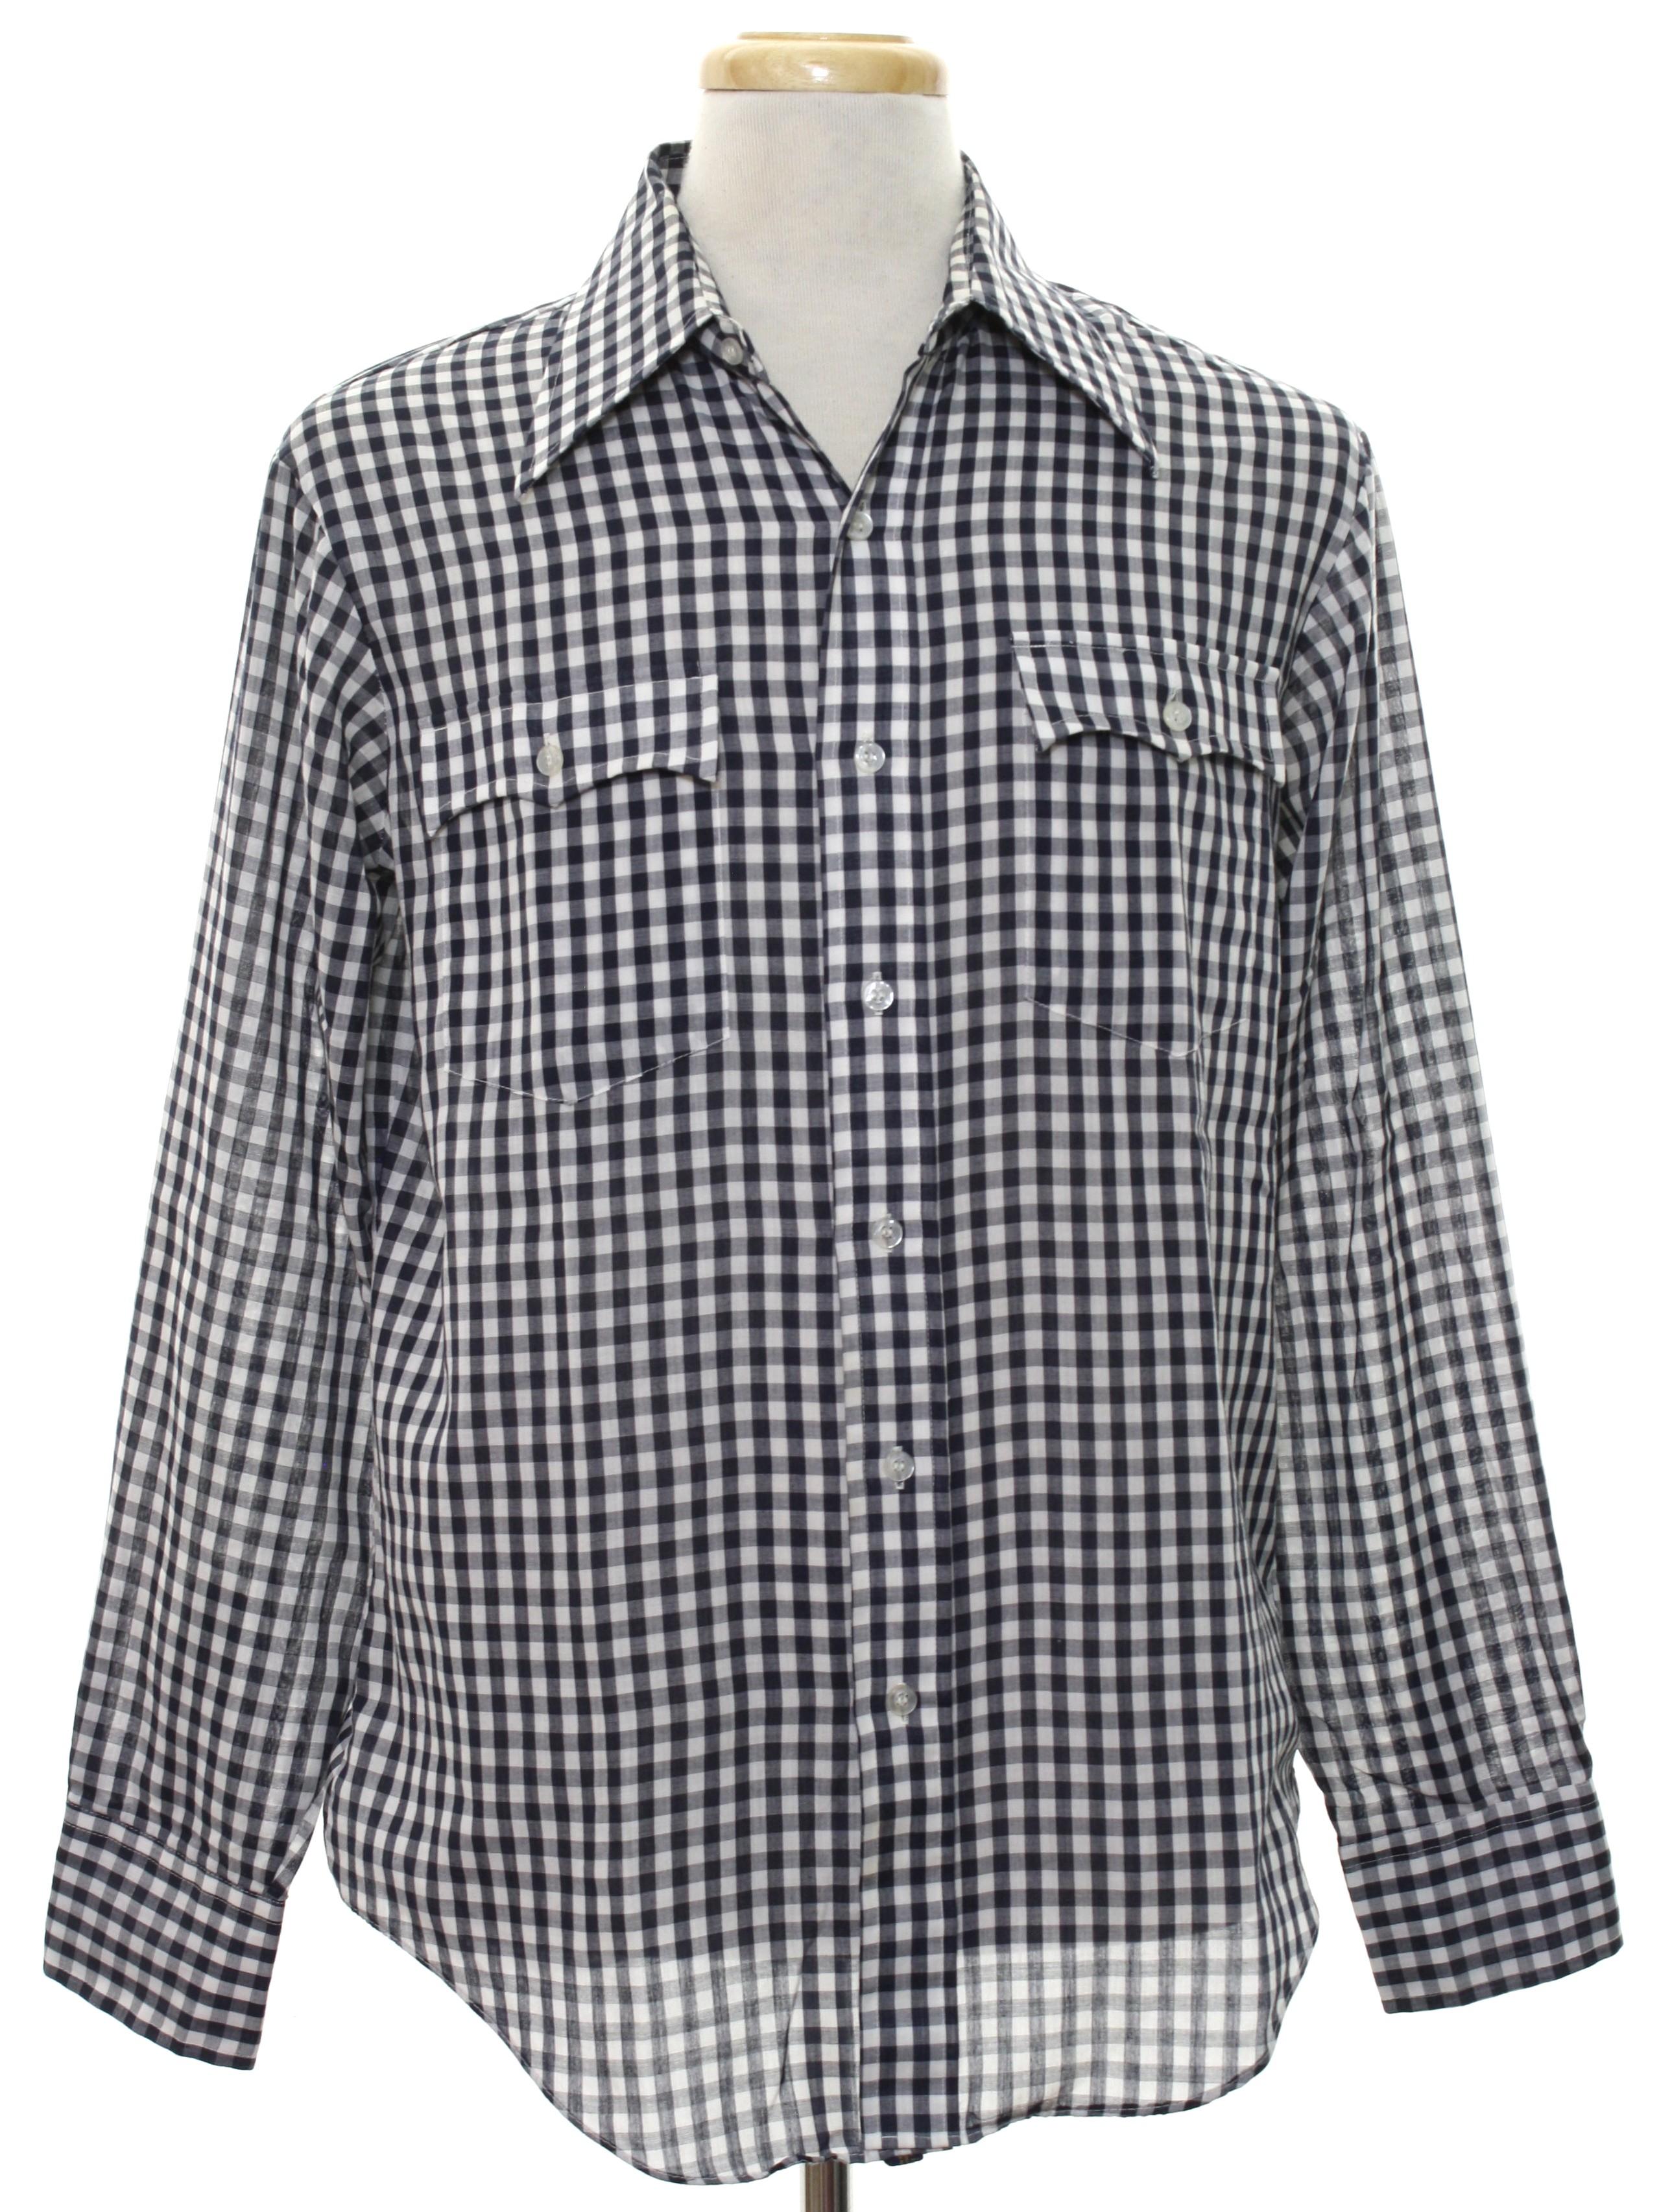 c126a69eaf6 Mens Black And White Plaid Dress Shirt - Cotswold Hire